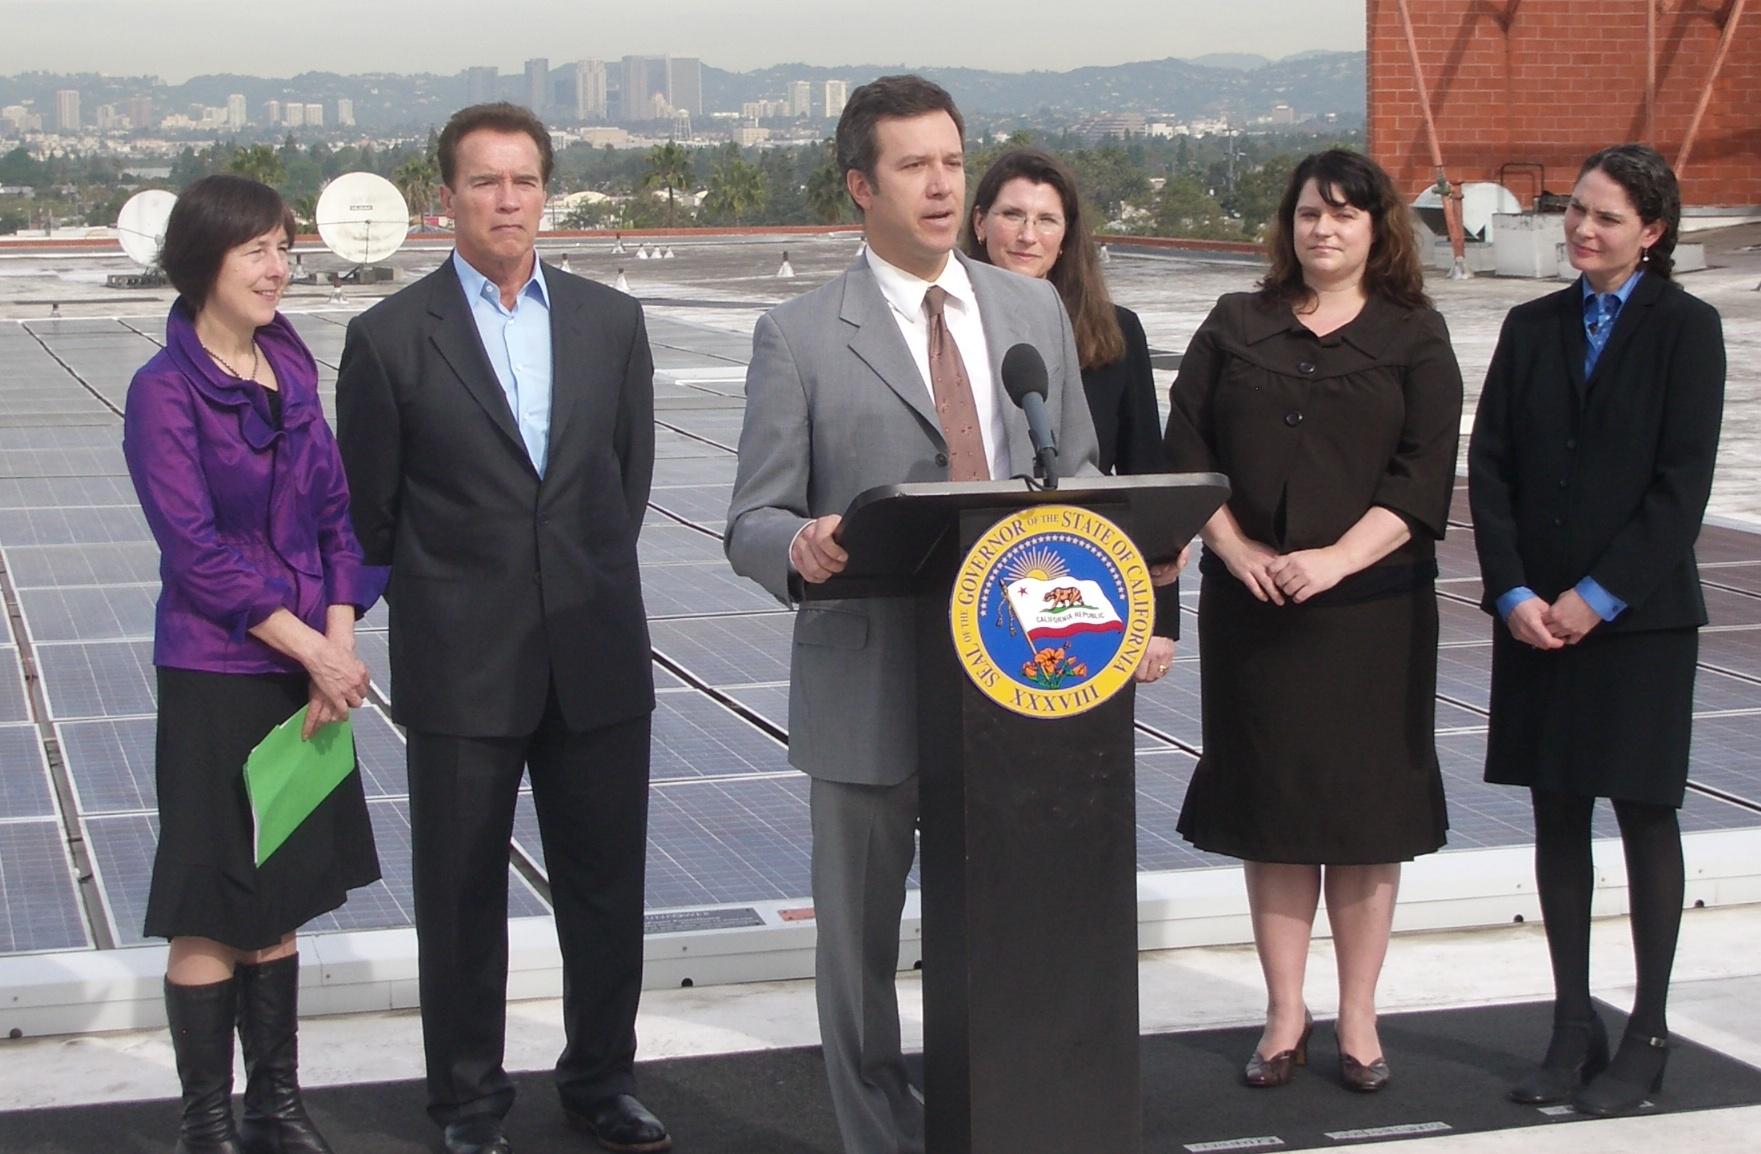 Adam with Nancy Skinner, Gov. Arnold Schwarzenegger, Julie Blunden, Sara Birmingham and Bernadette del Chiaro at the signing of AB 510 in 2010, which raised the net metering cap in California